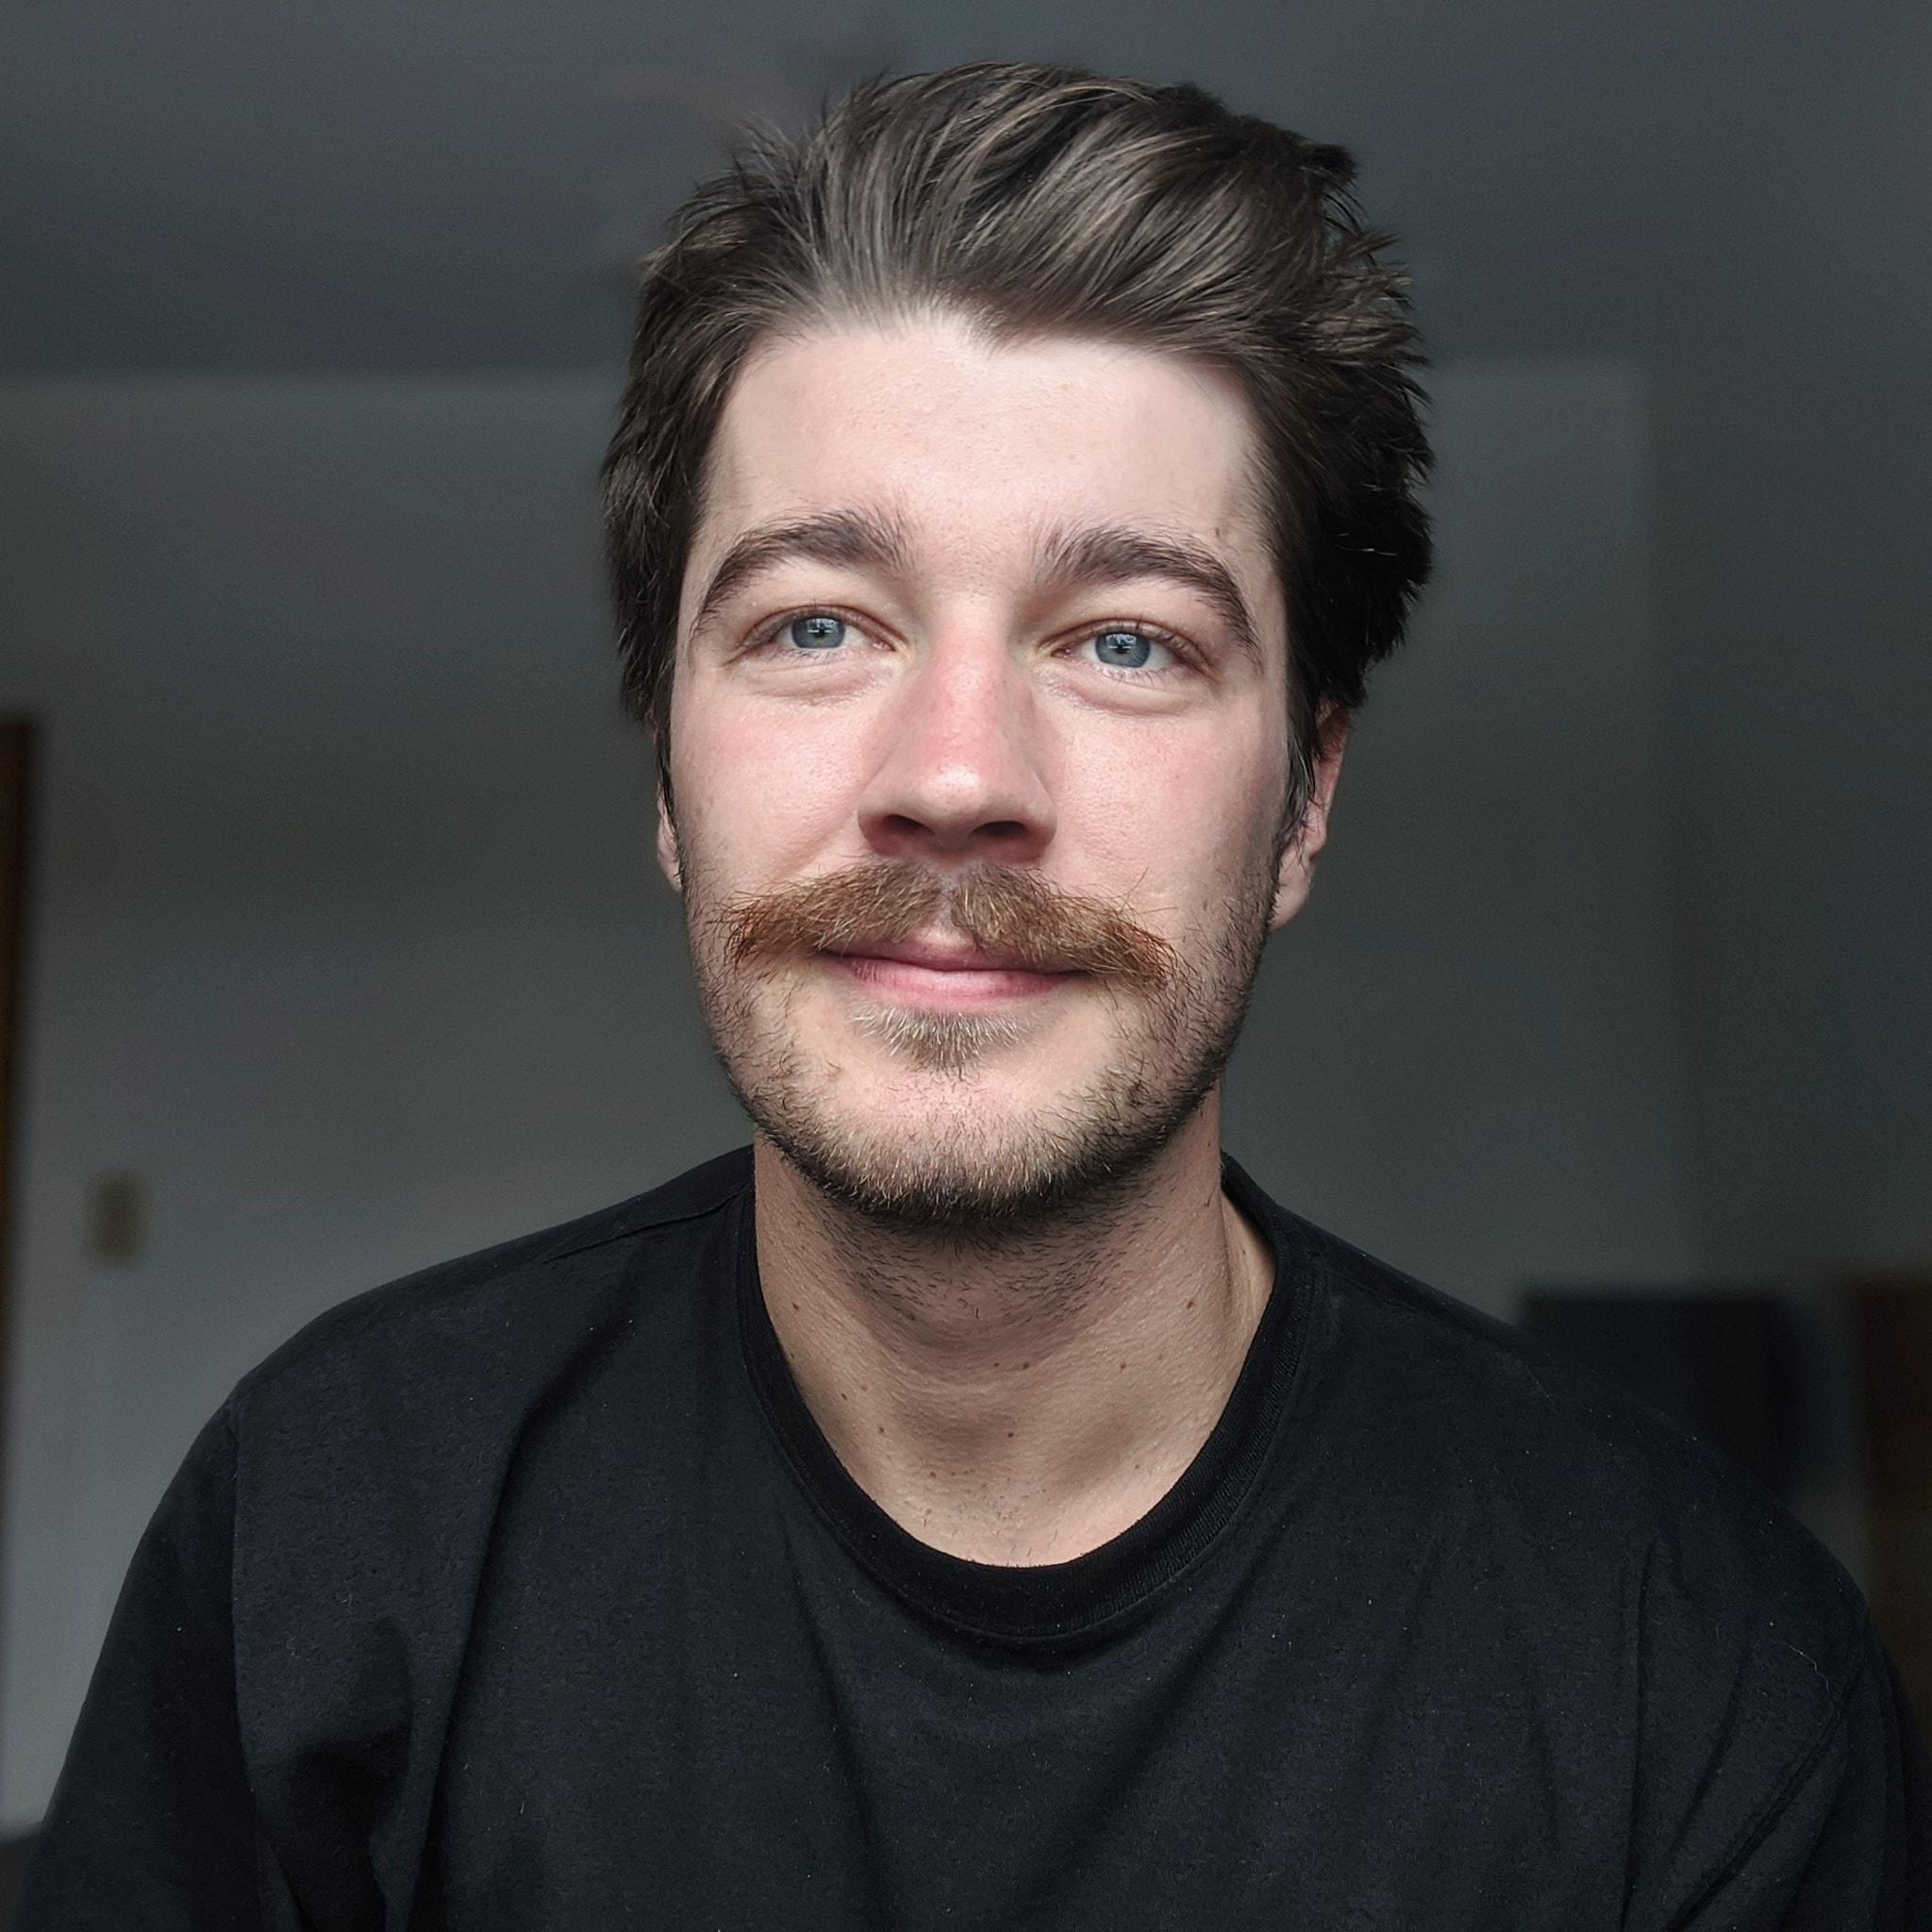 Image of Ethan Ashton